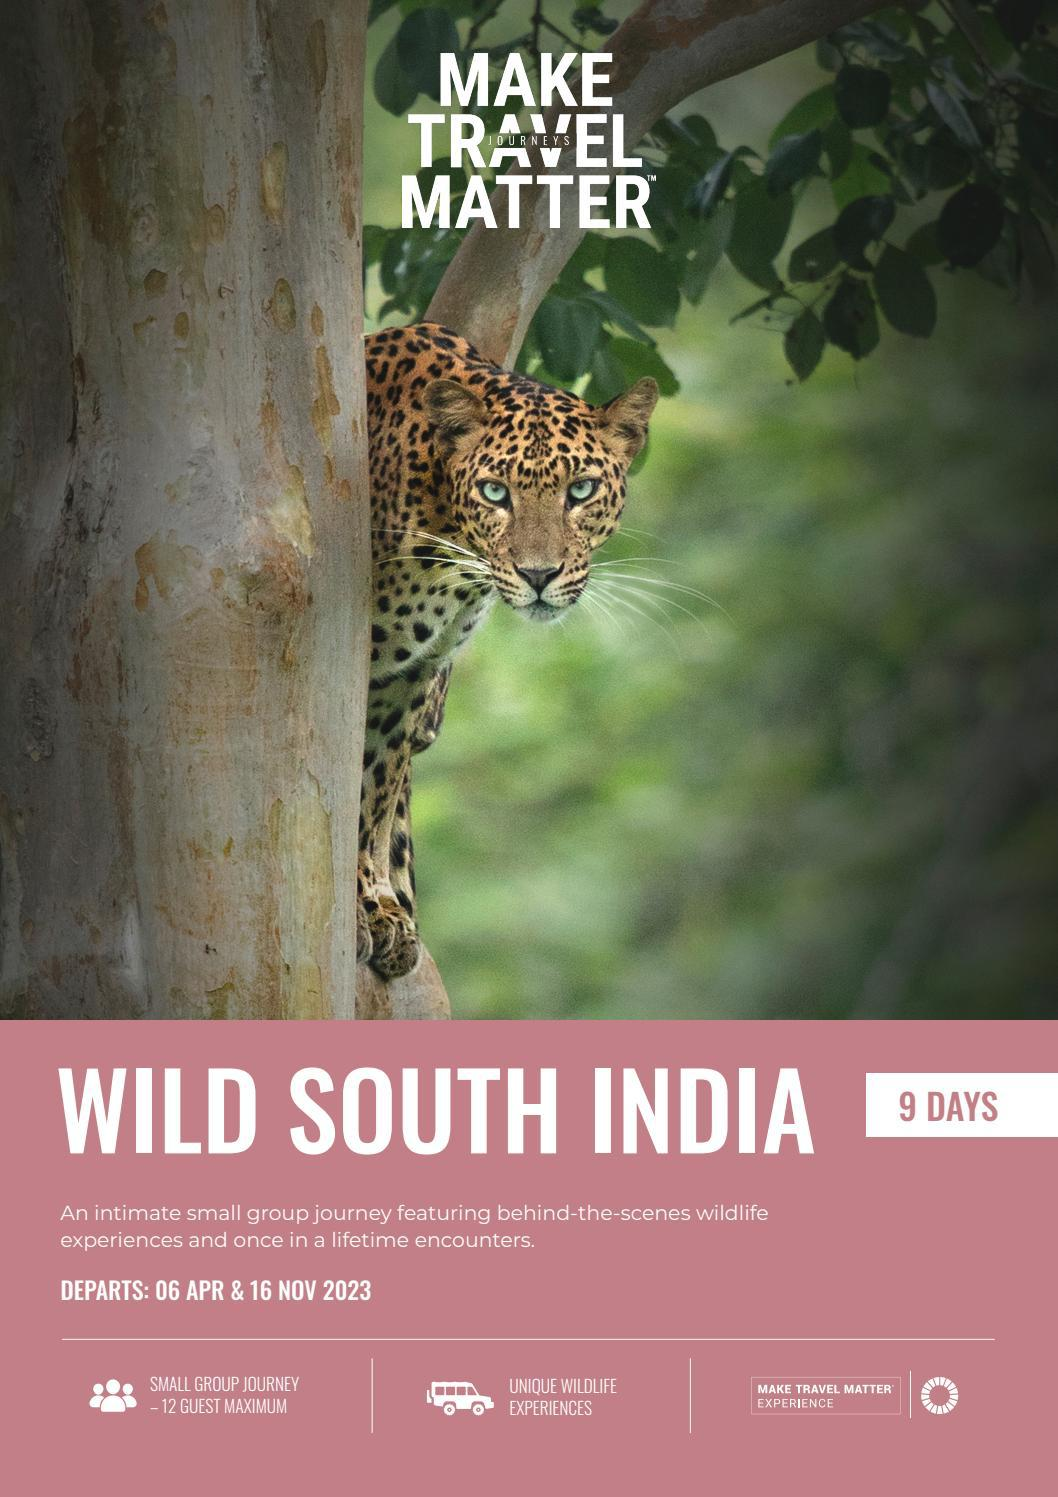 Wild South India